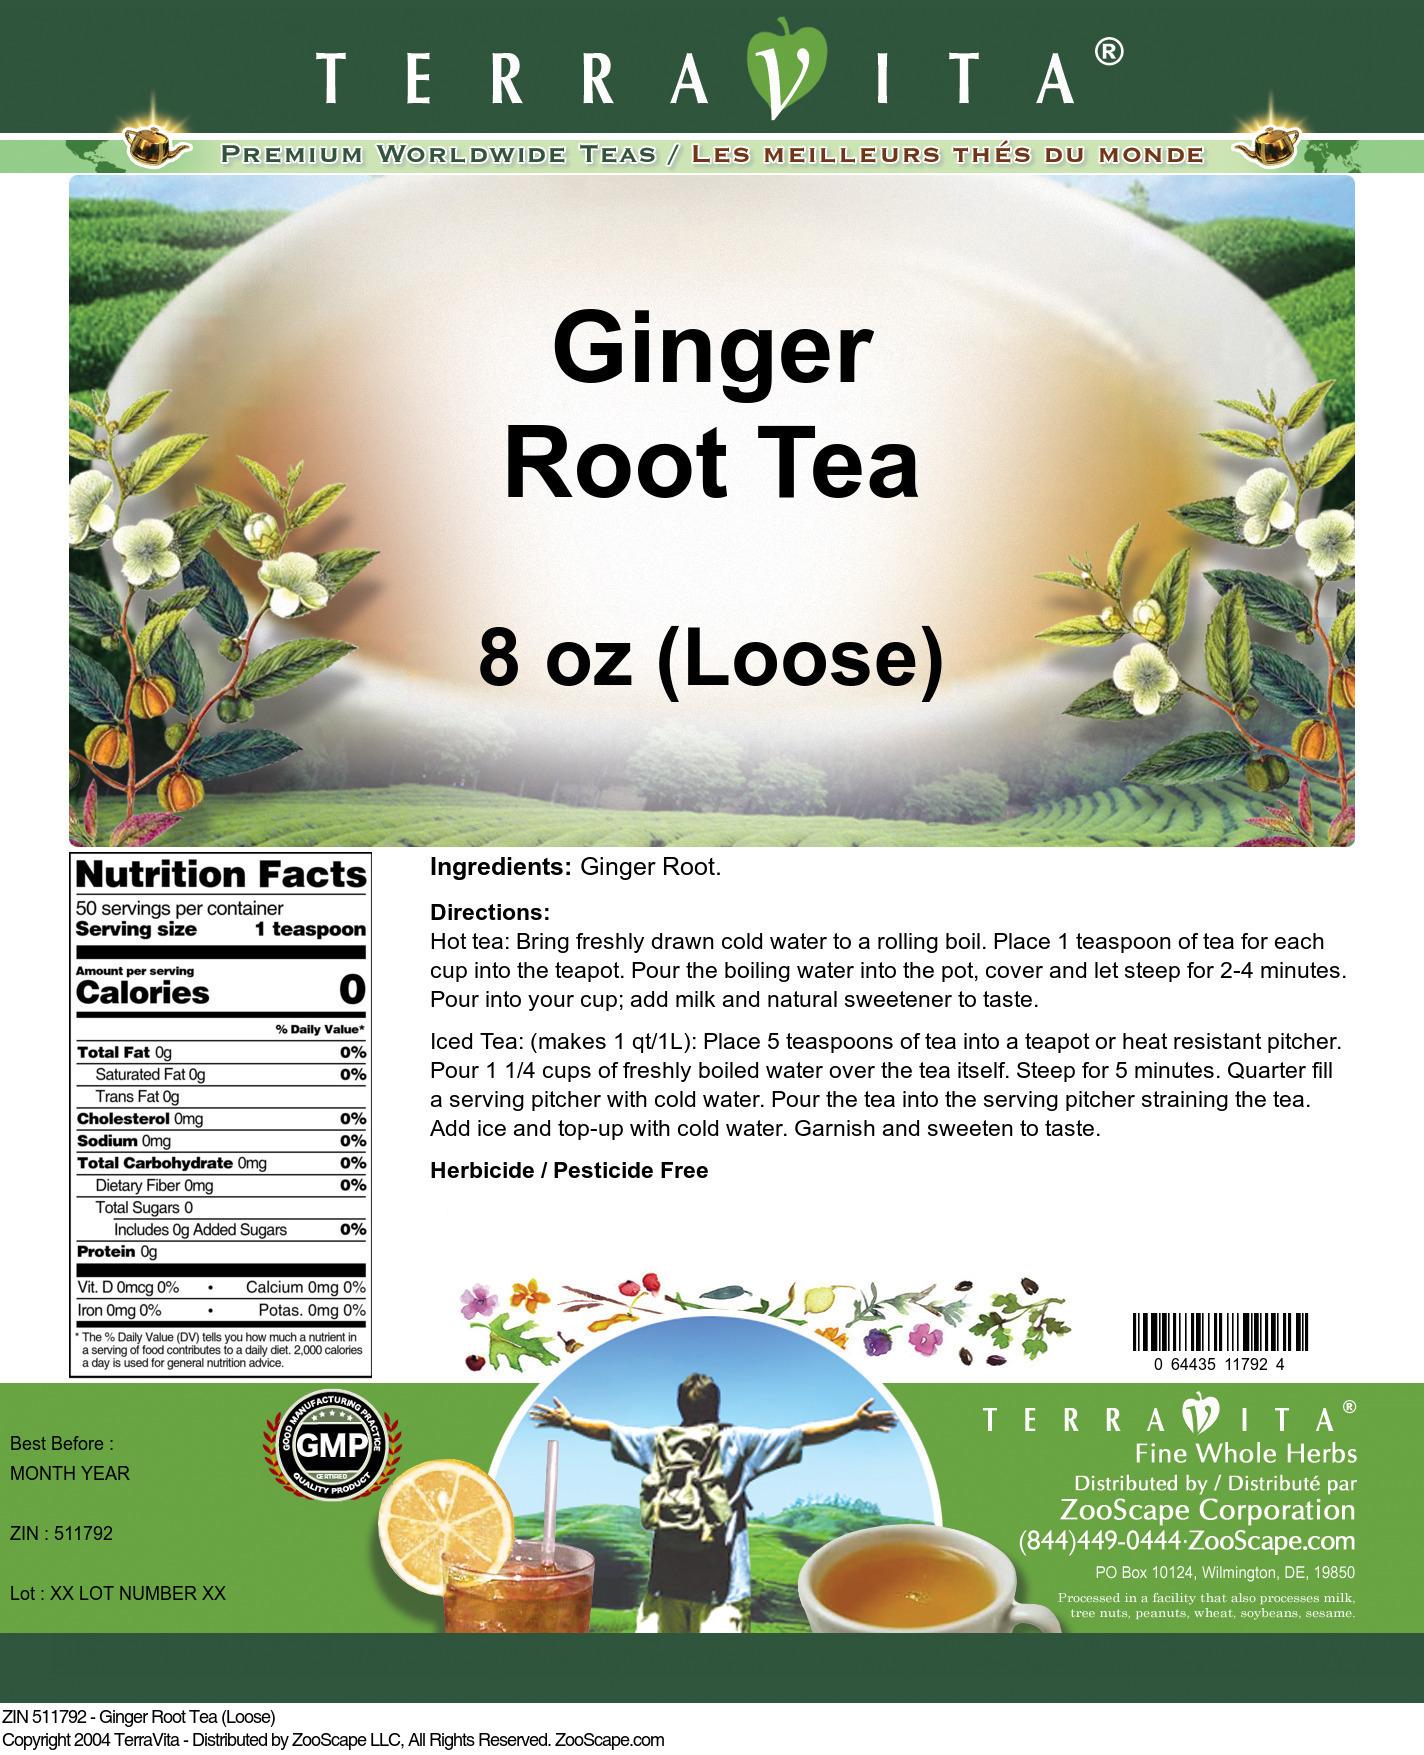 Ginger Root Tea (Loose)